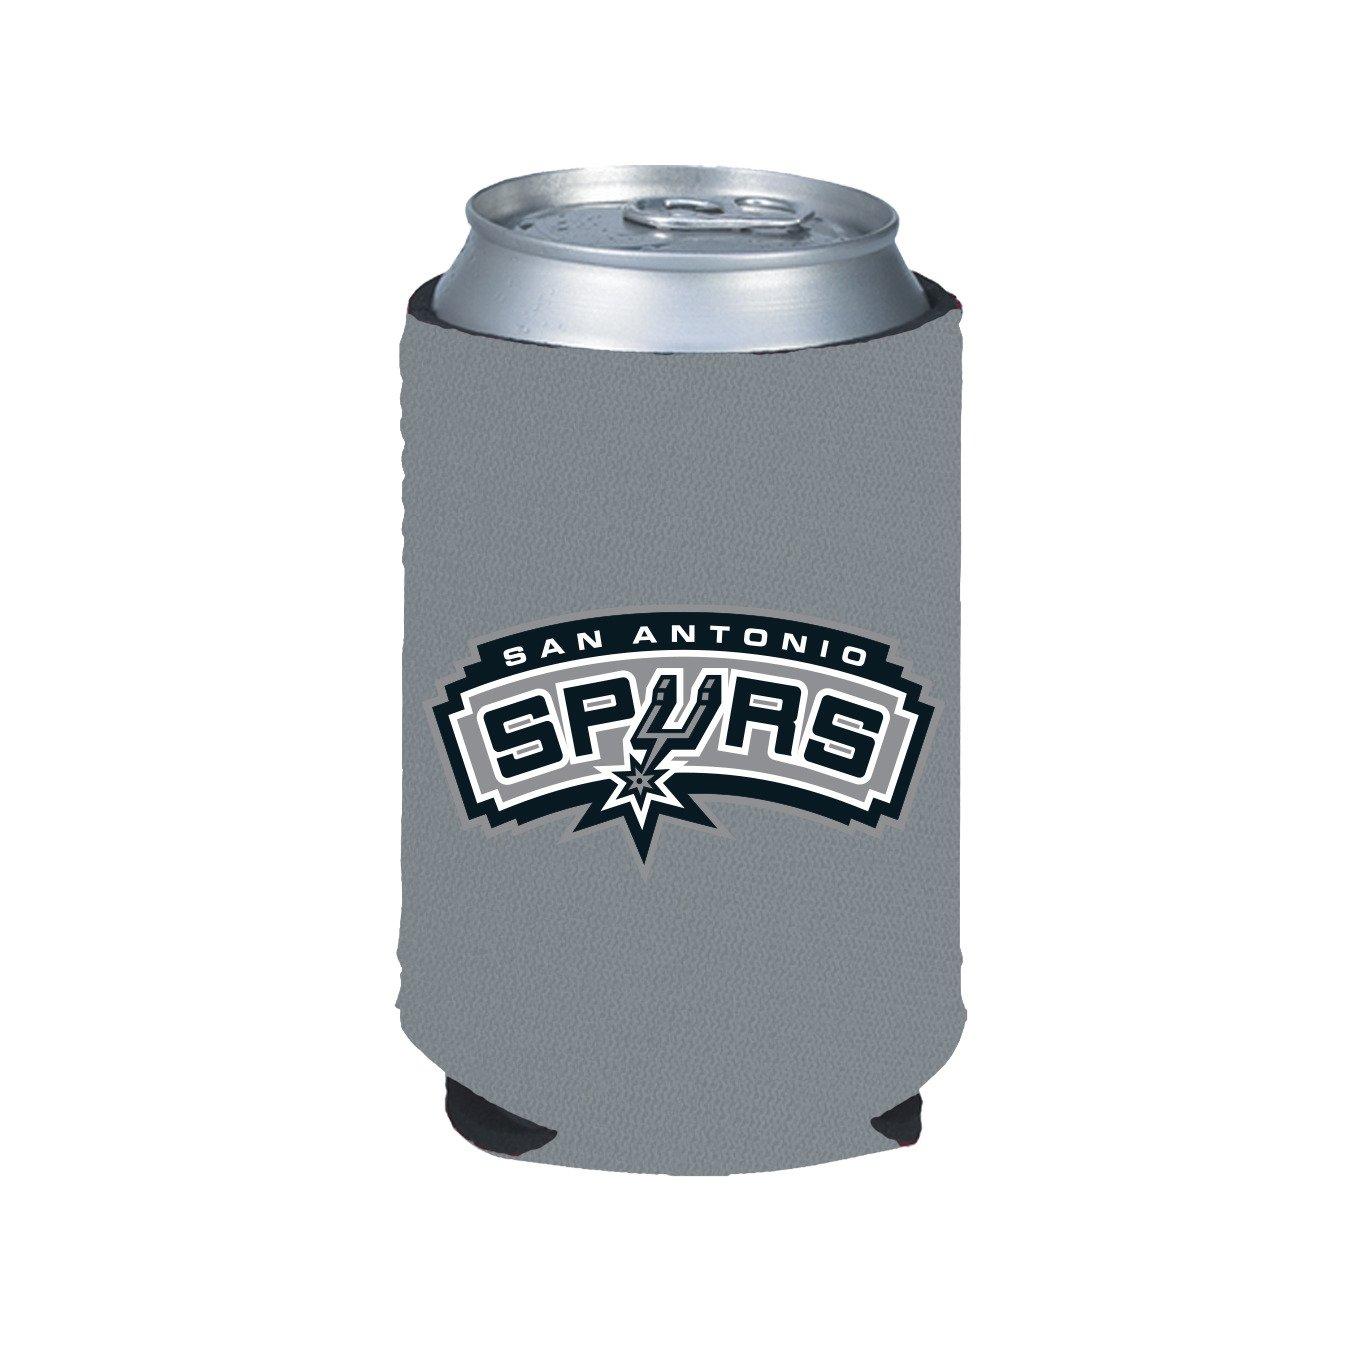 Kolder San Antonio Spurs Special Kolder Kaddy™